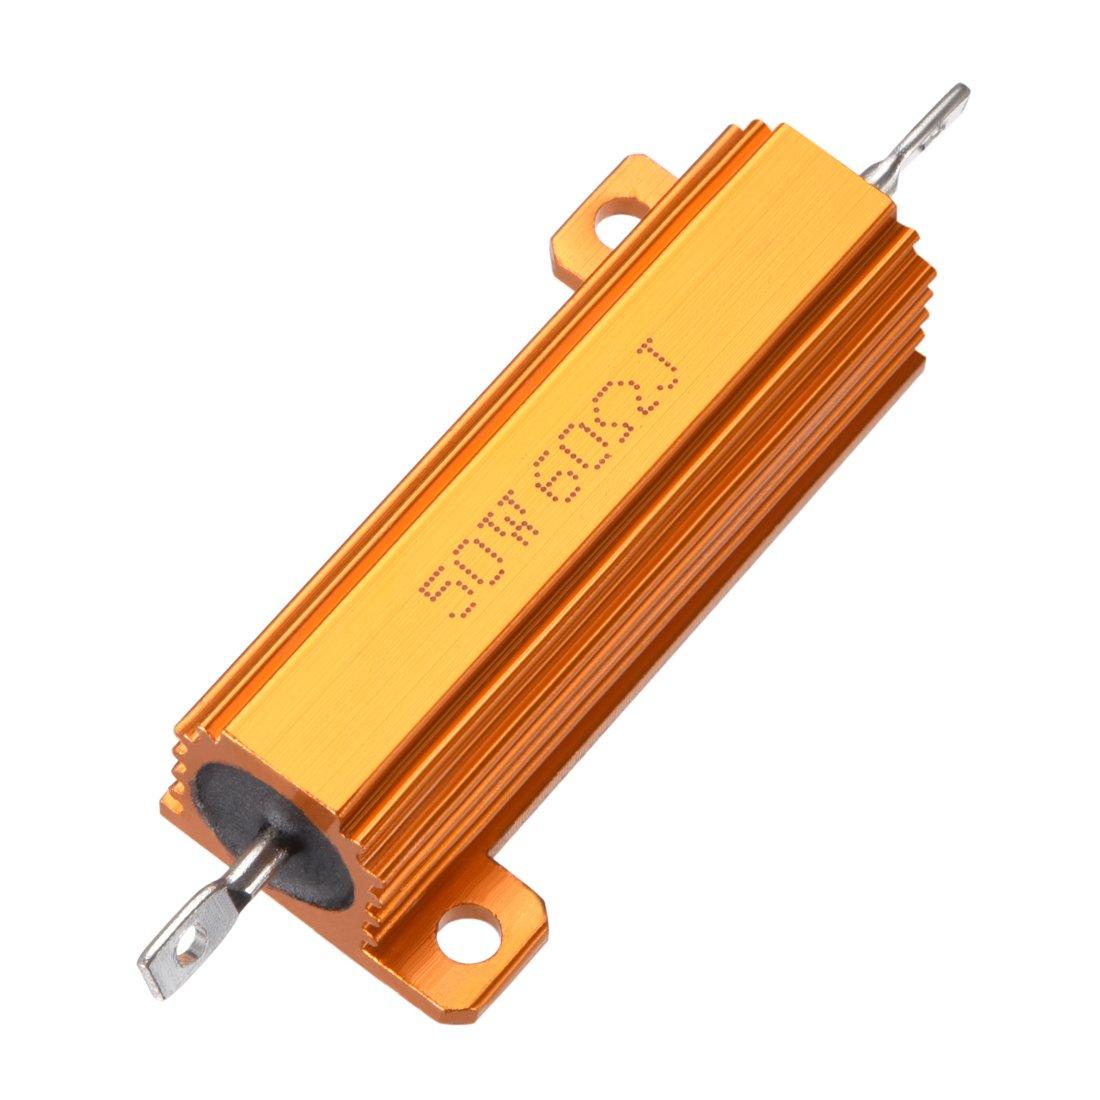 Zinc//Yellow AHC K-ZYSAlB1230B5 M12 x 30 mm Loose Bolt Shield Anchor Pack of 5